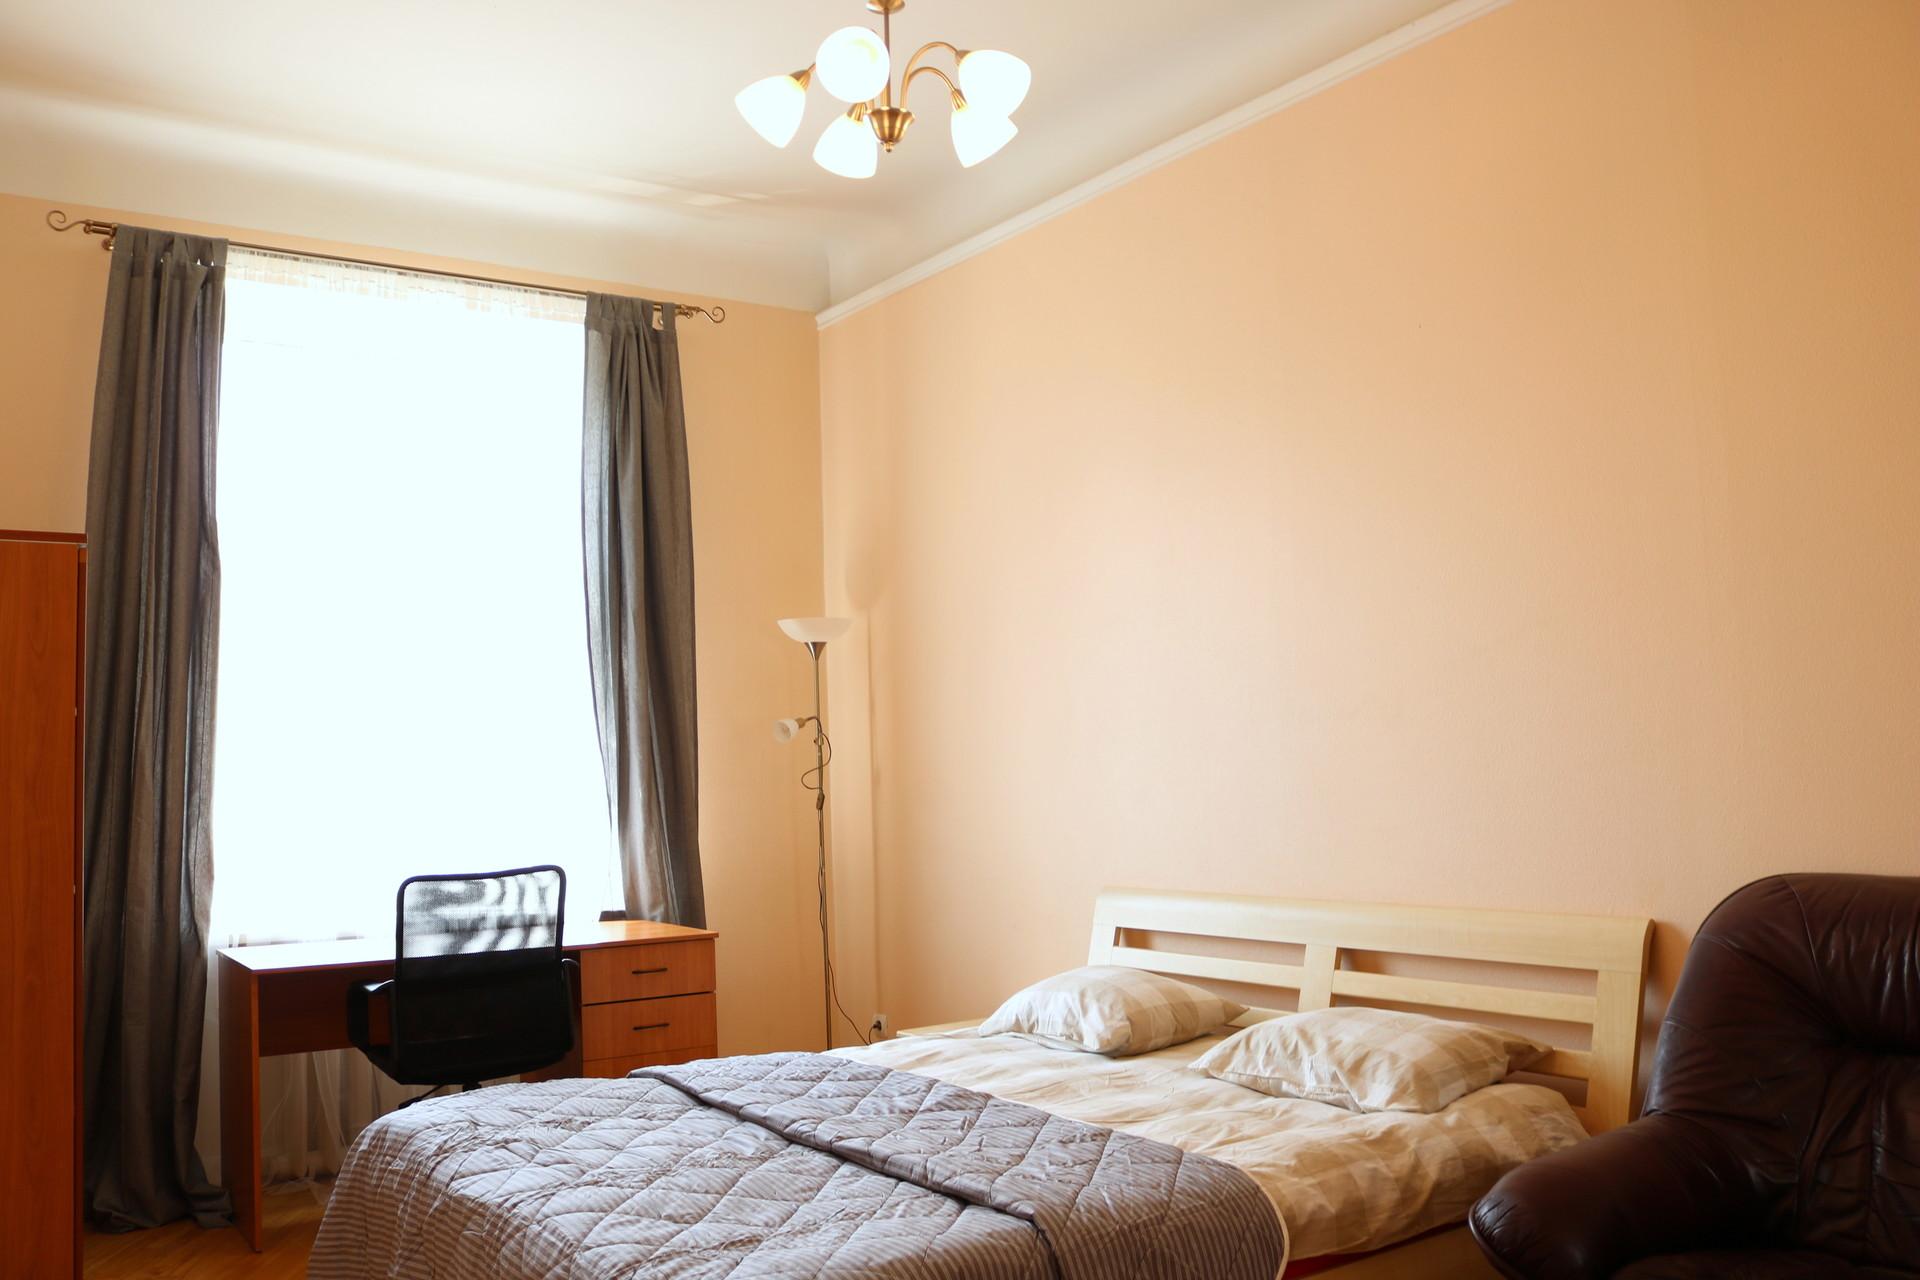 3-bedroom-apartment-riga-centre-77326f24c2789312208eca45dfd79da7